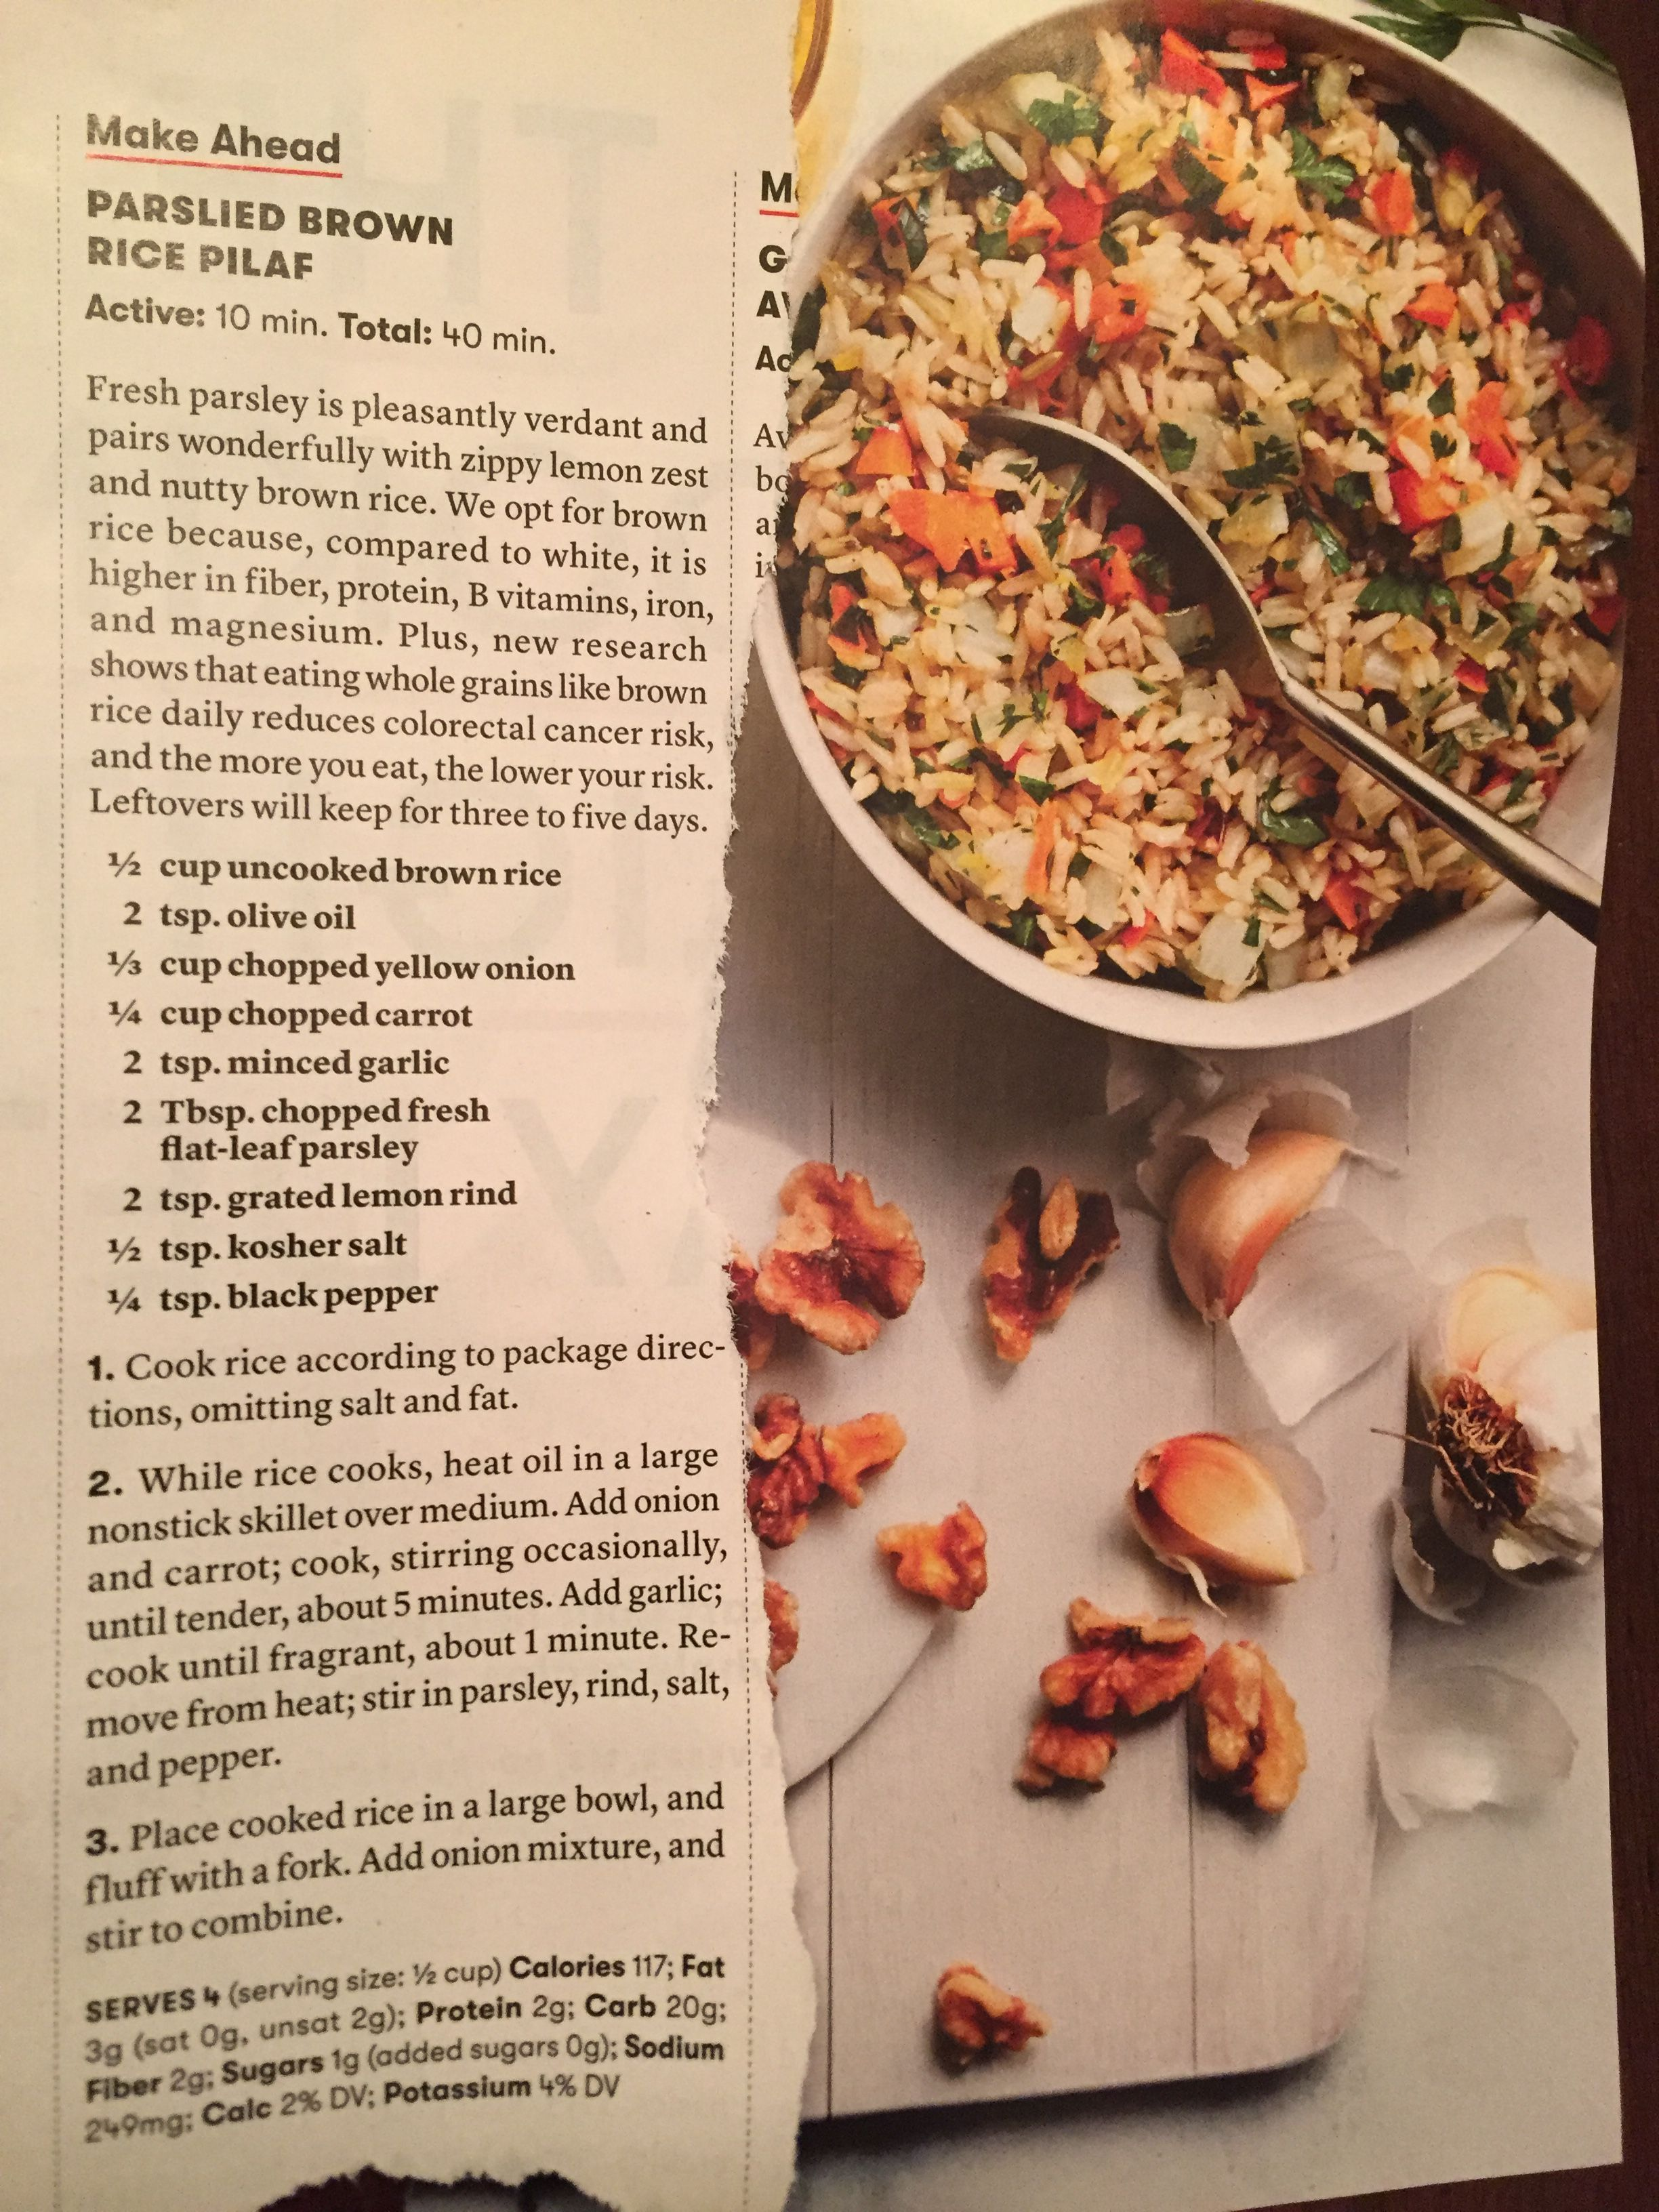 Parsley Brown Rice Pilaf Entree Recipes Brown Rice Pilaf